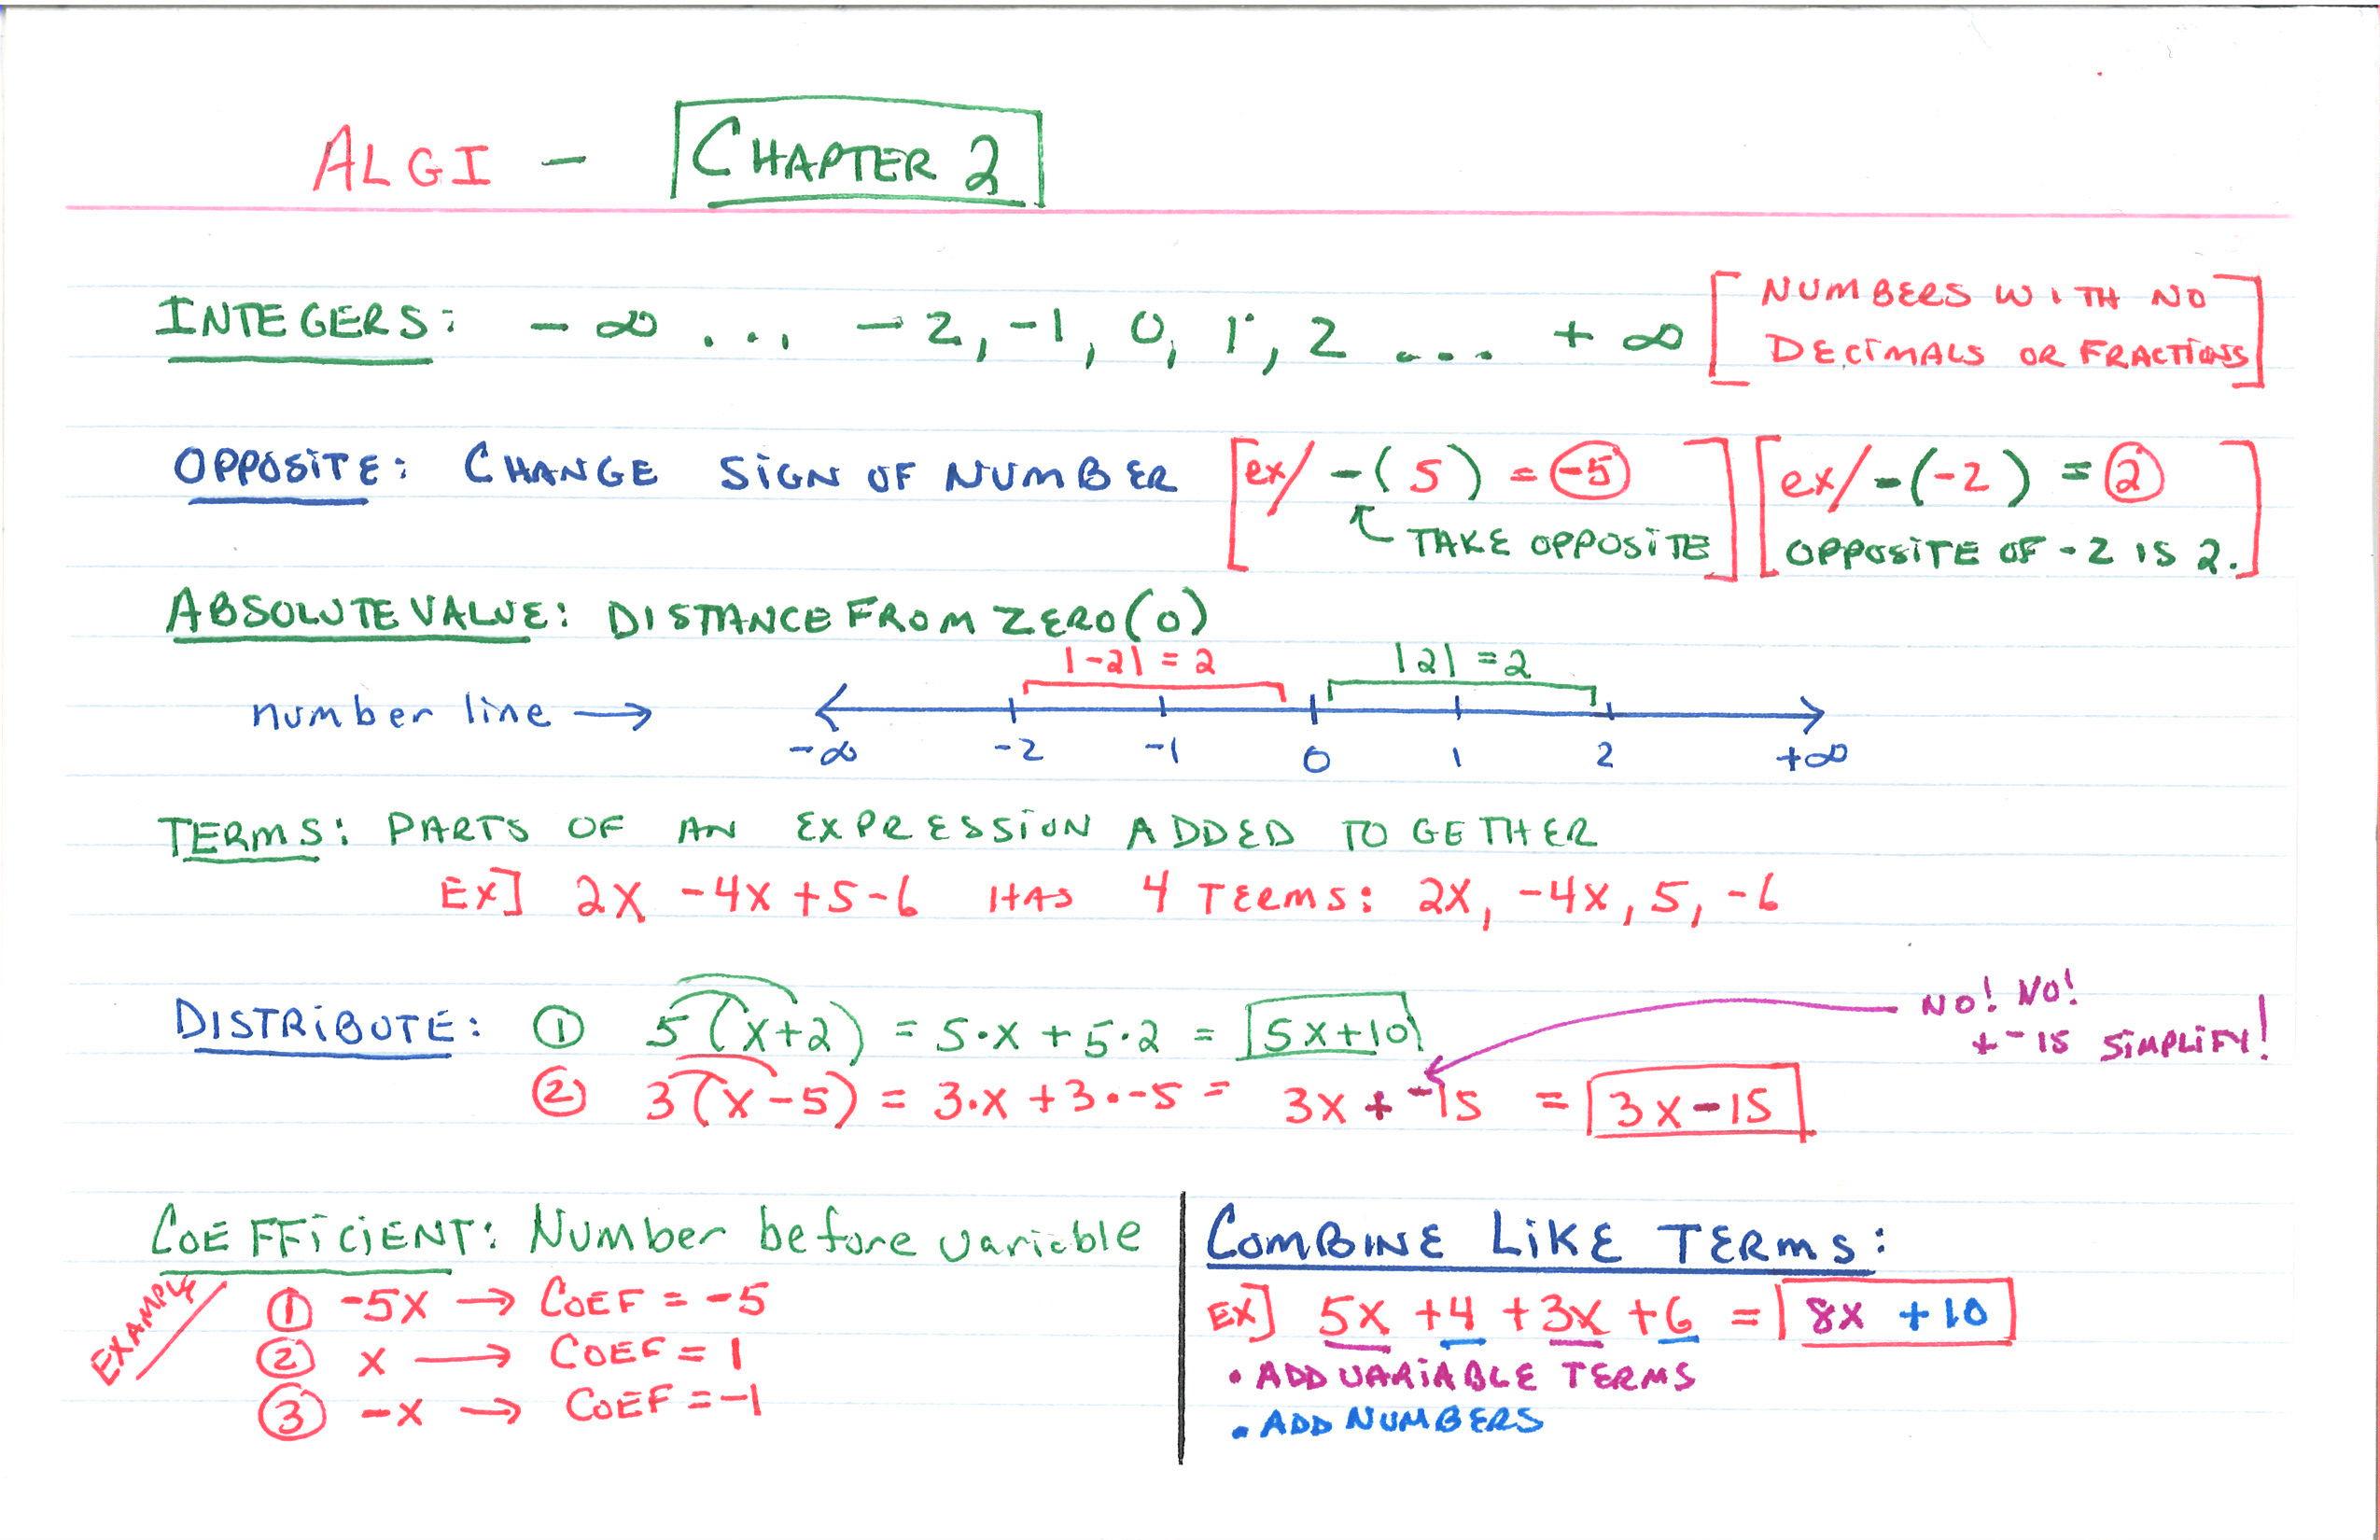 Holt Mcdougal Algebra 1 Chapter 2 Test Answers